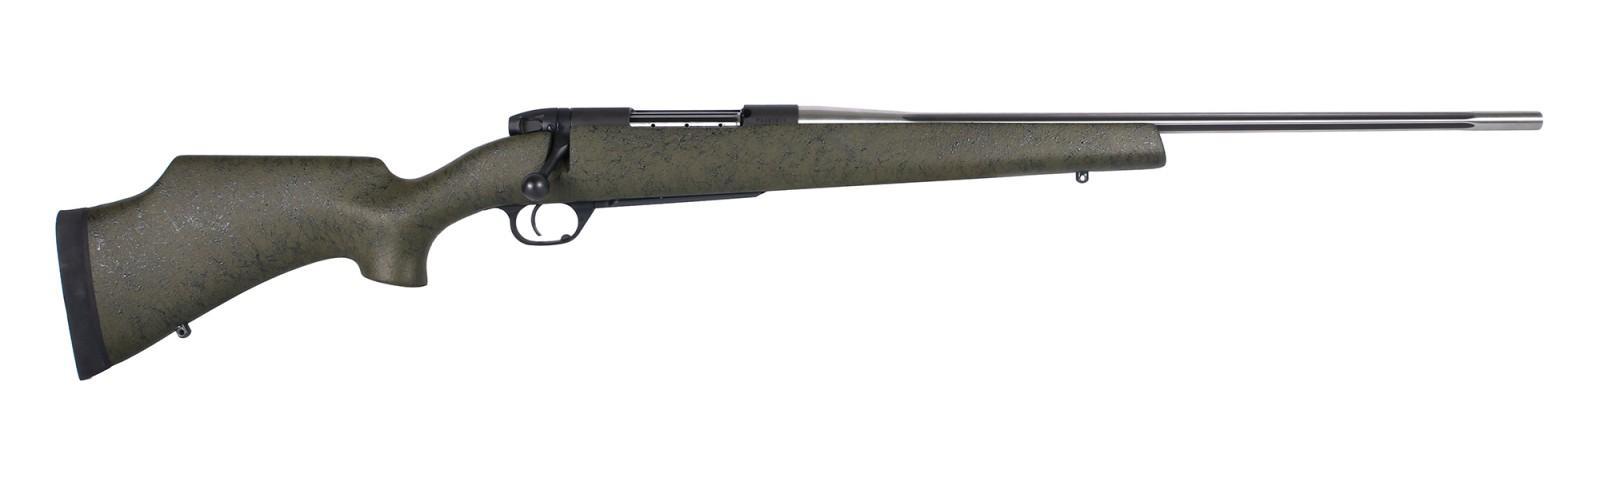 Weatherby MCUS308NR40 Mark V Camilla Ultra Lightweight  Bolt 308 Winchester 22